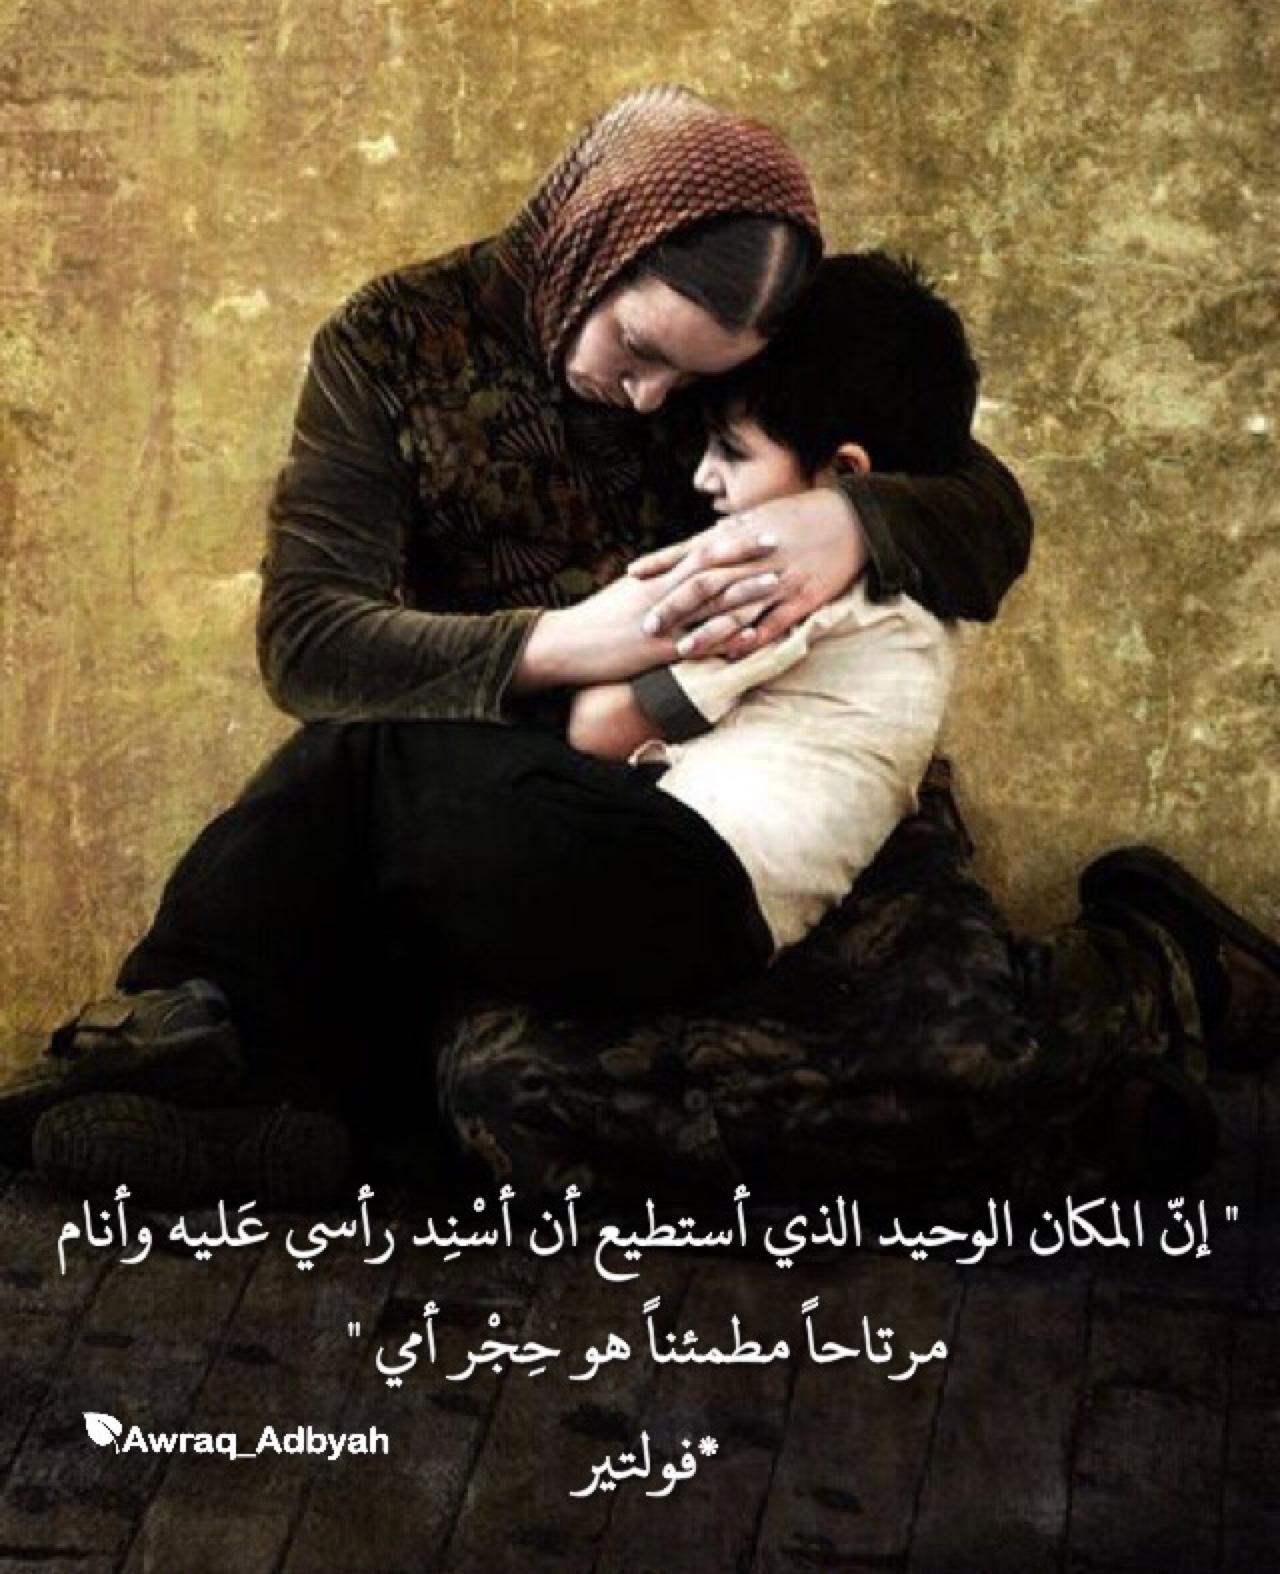 بالصور صور عن الام حزينه , احزان فقدام ام 1329 2